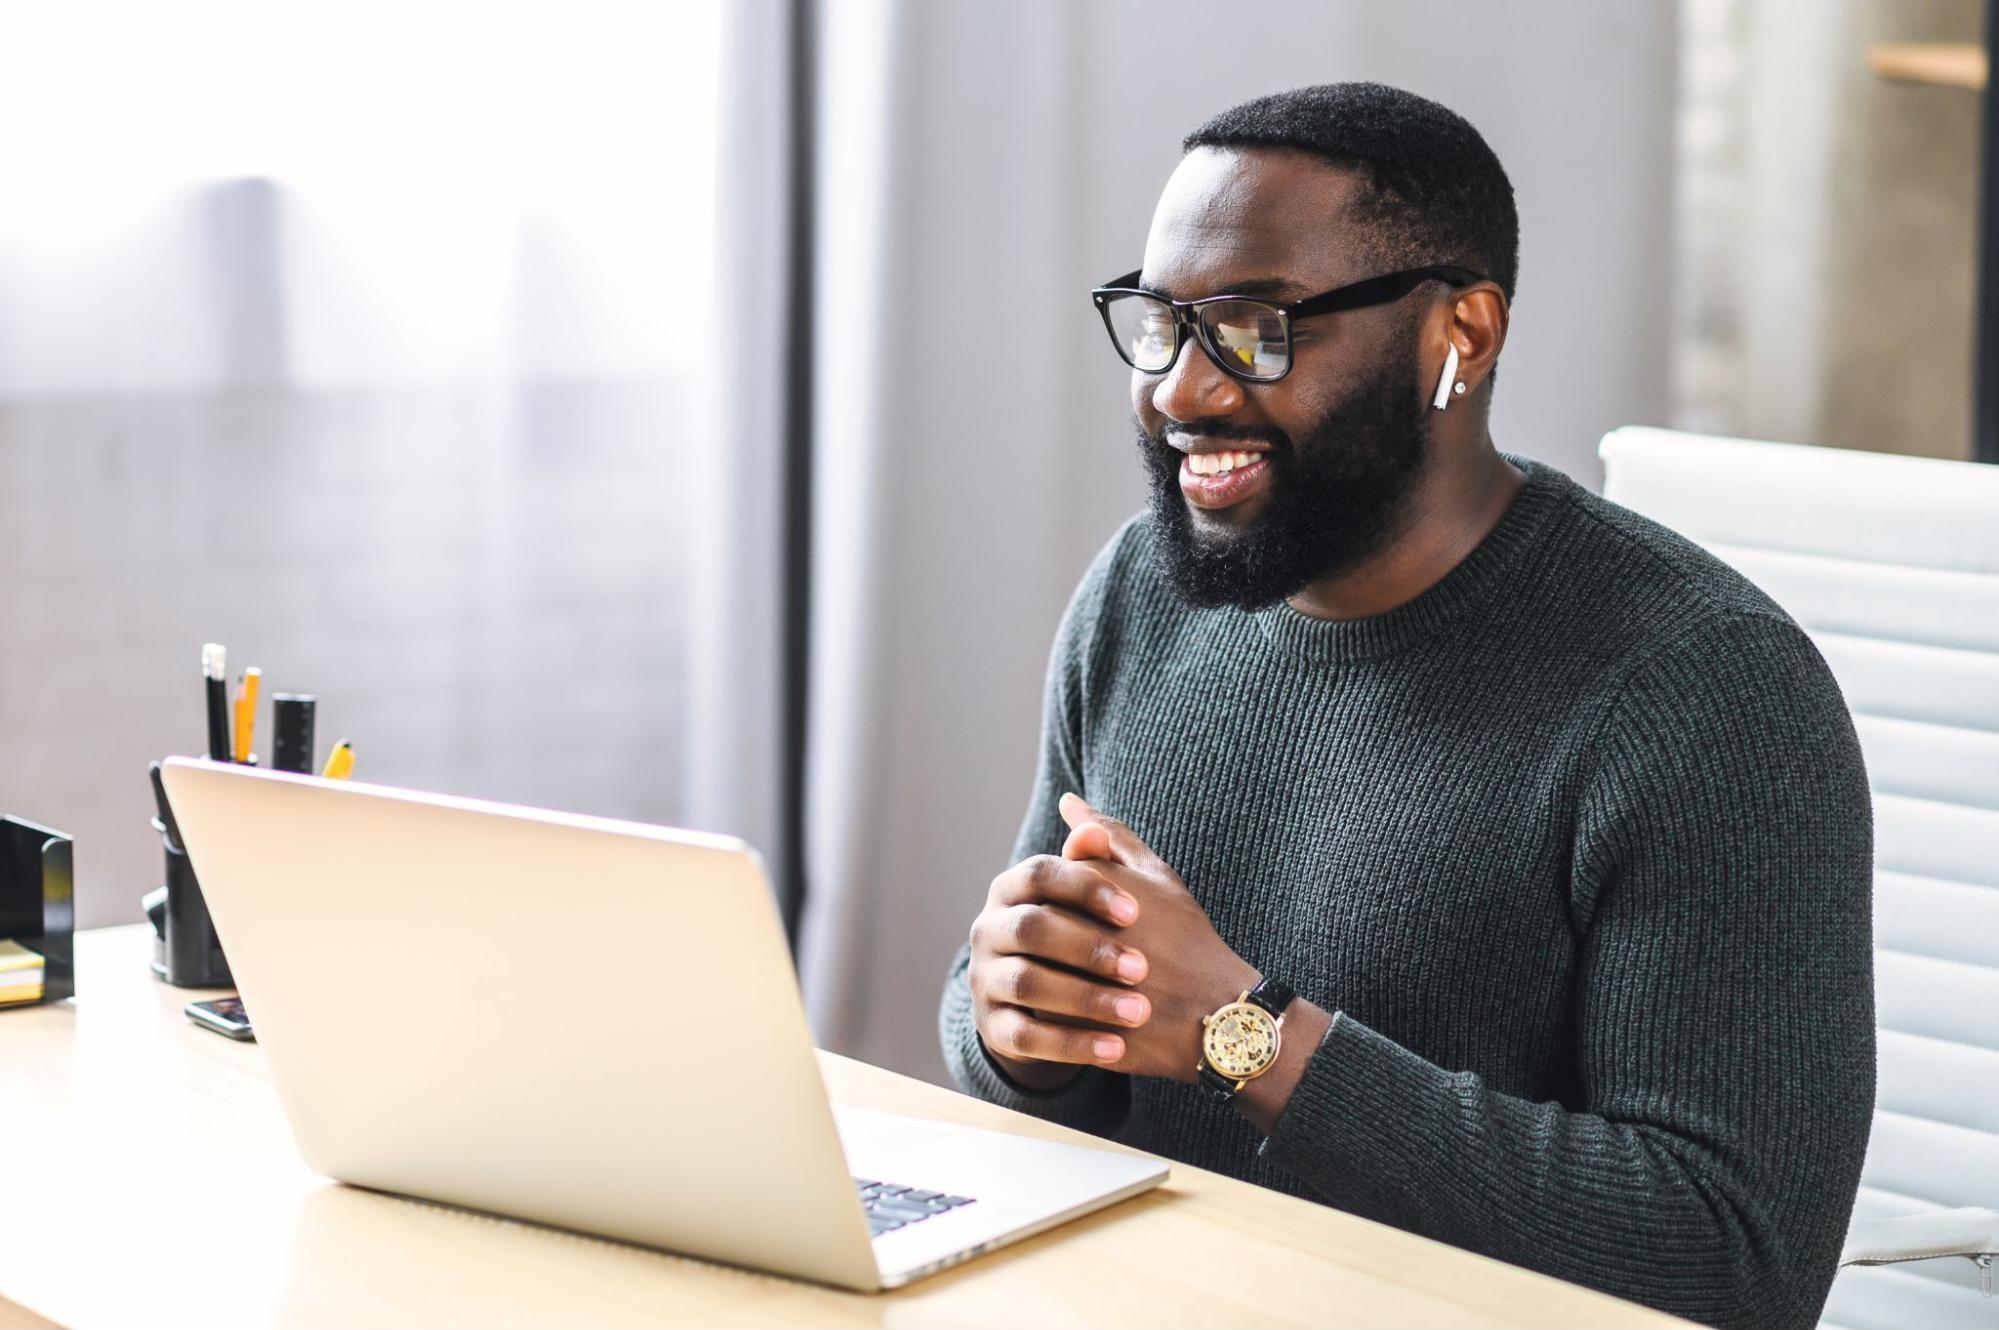 customer retention software: Smiling man looking at his laptop